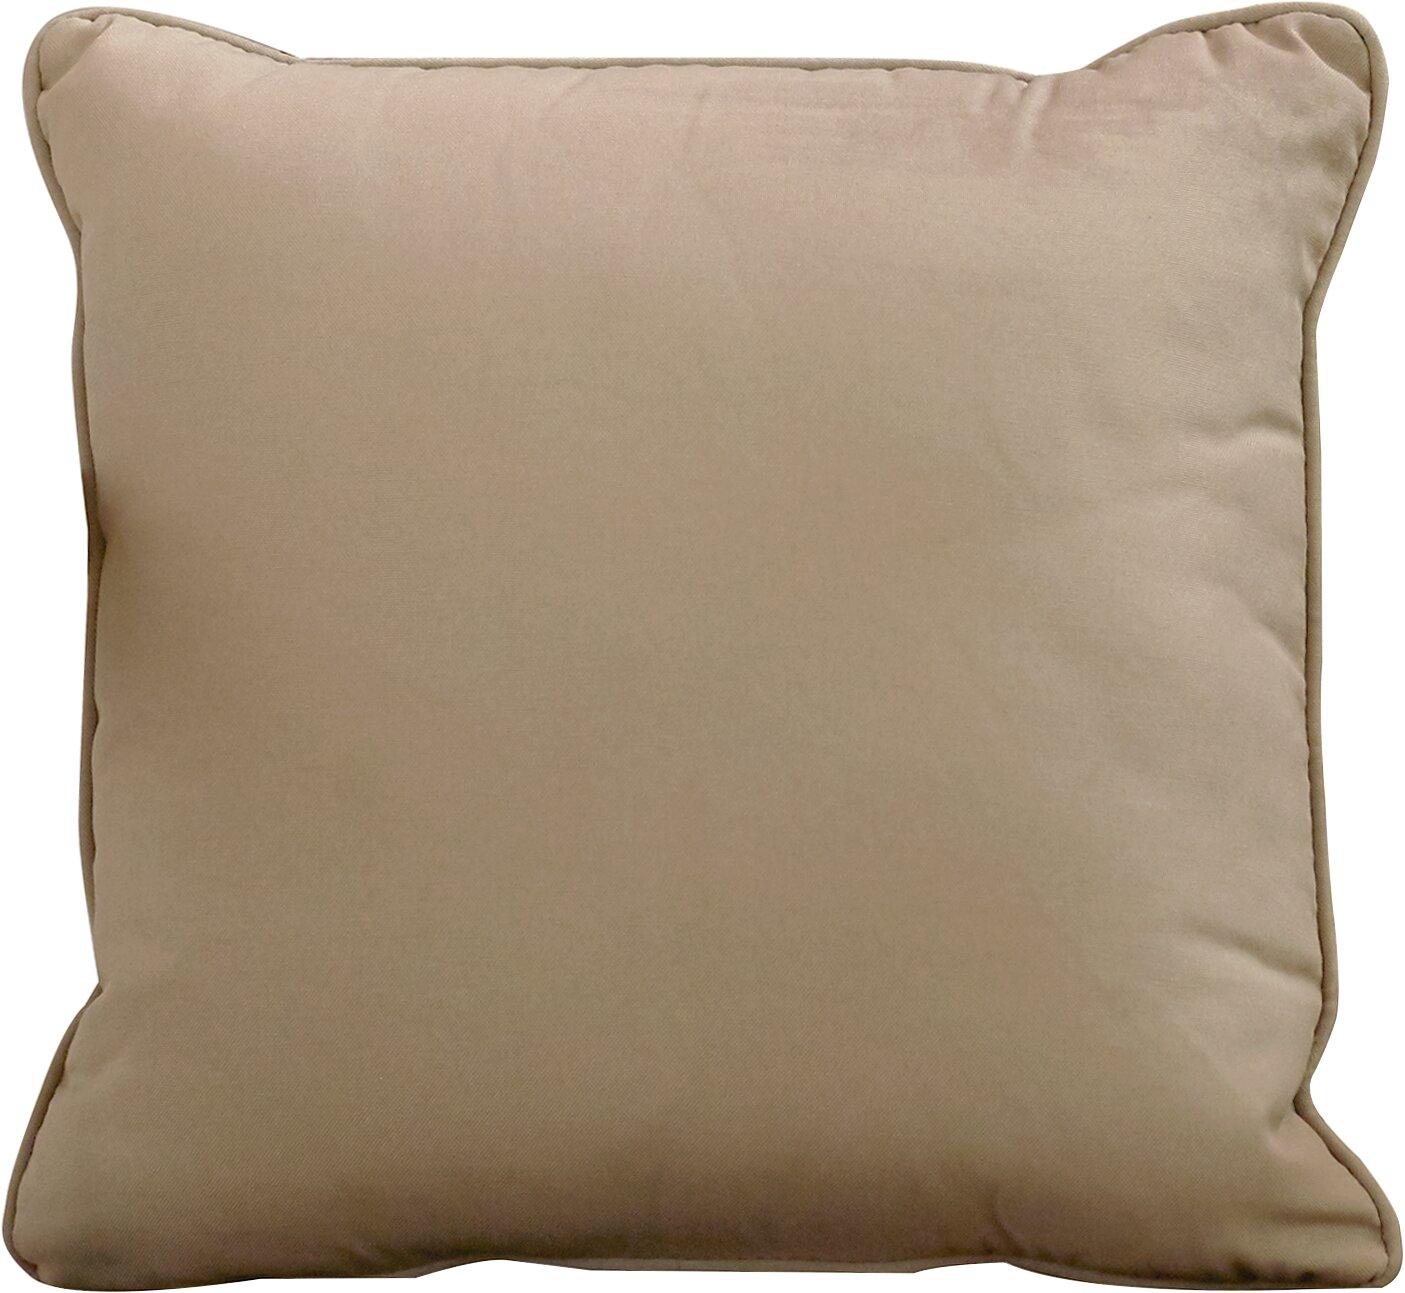 Zipcode Design Lavonna Outdoor Throw Pillow Reviews Wayfair